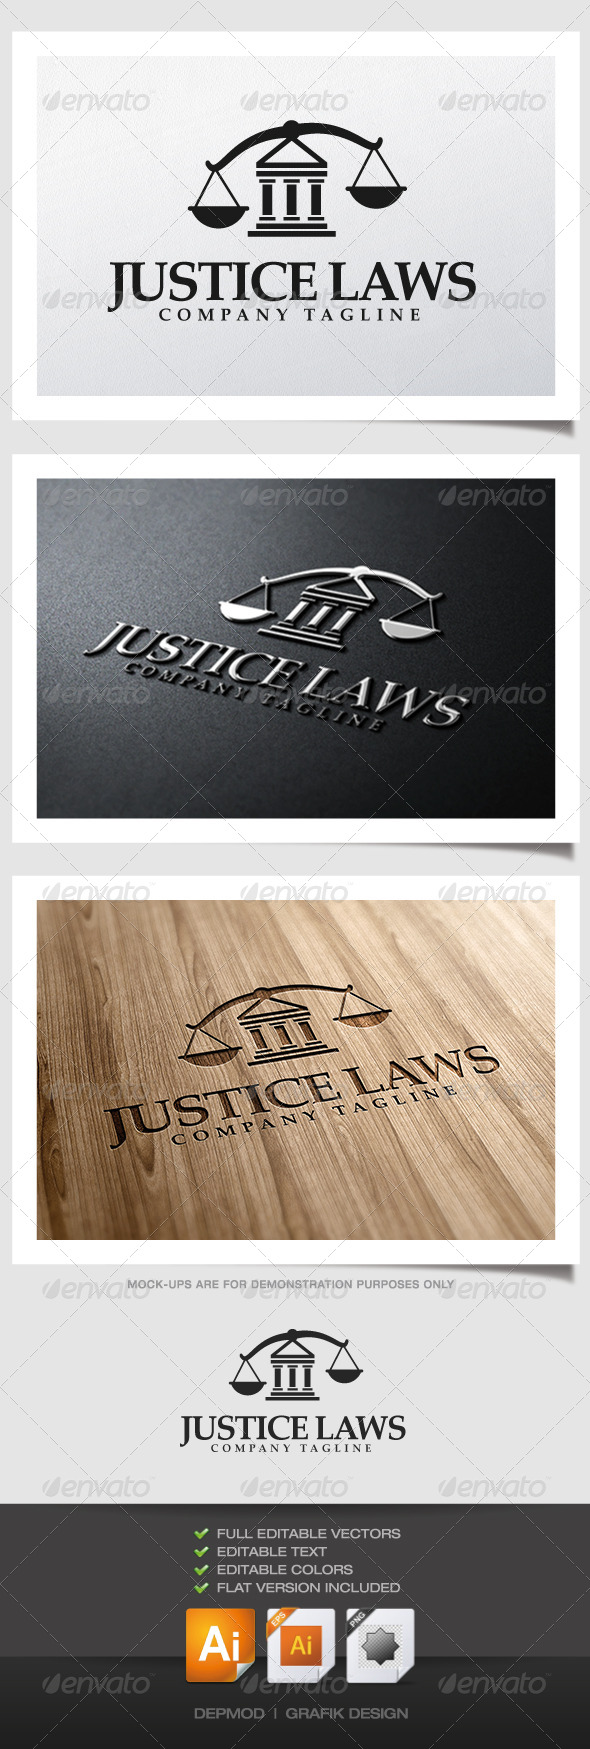 GraphicRiver Justice Laws Logo 5068944